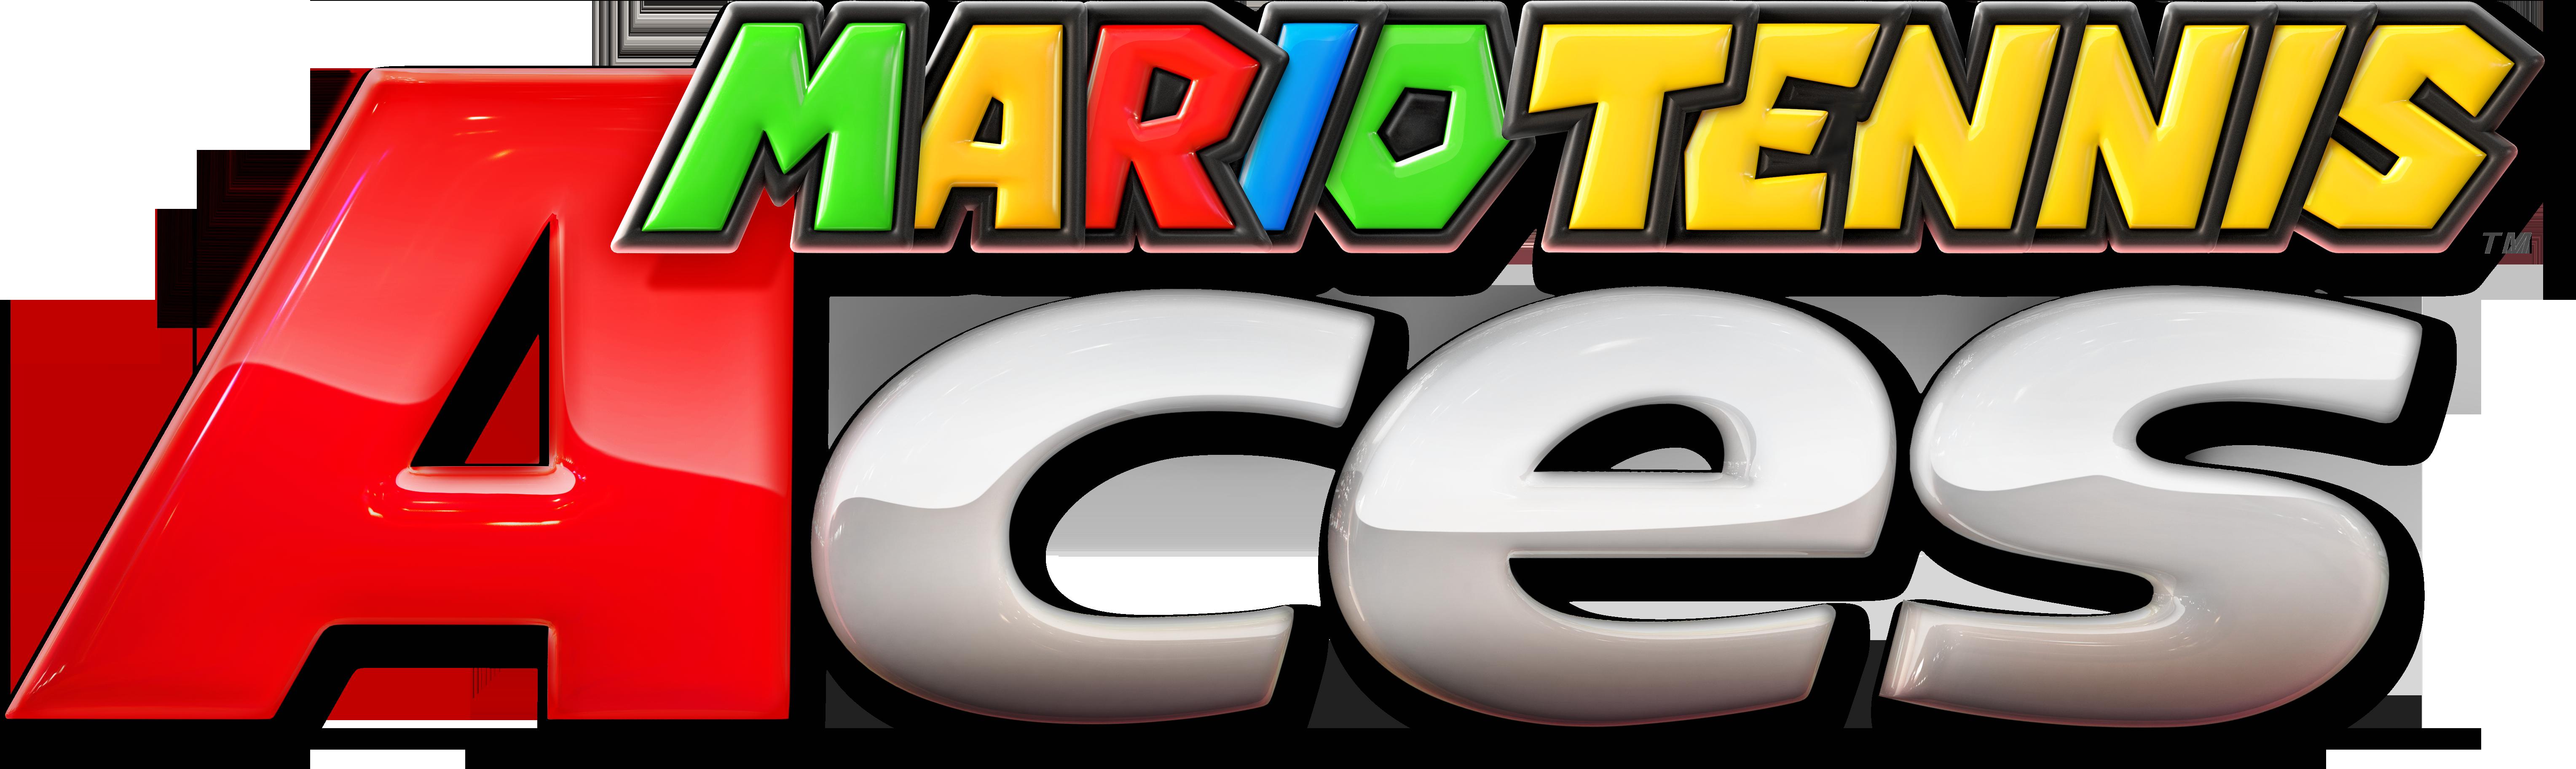 Mario Tennis Aces Logo Png Image Ace Logo Video Game Genre Logos